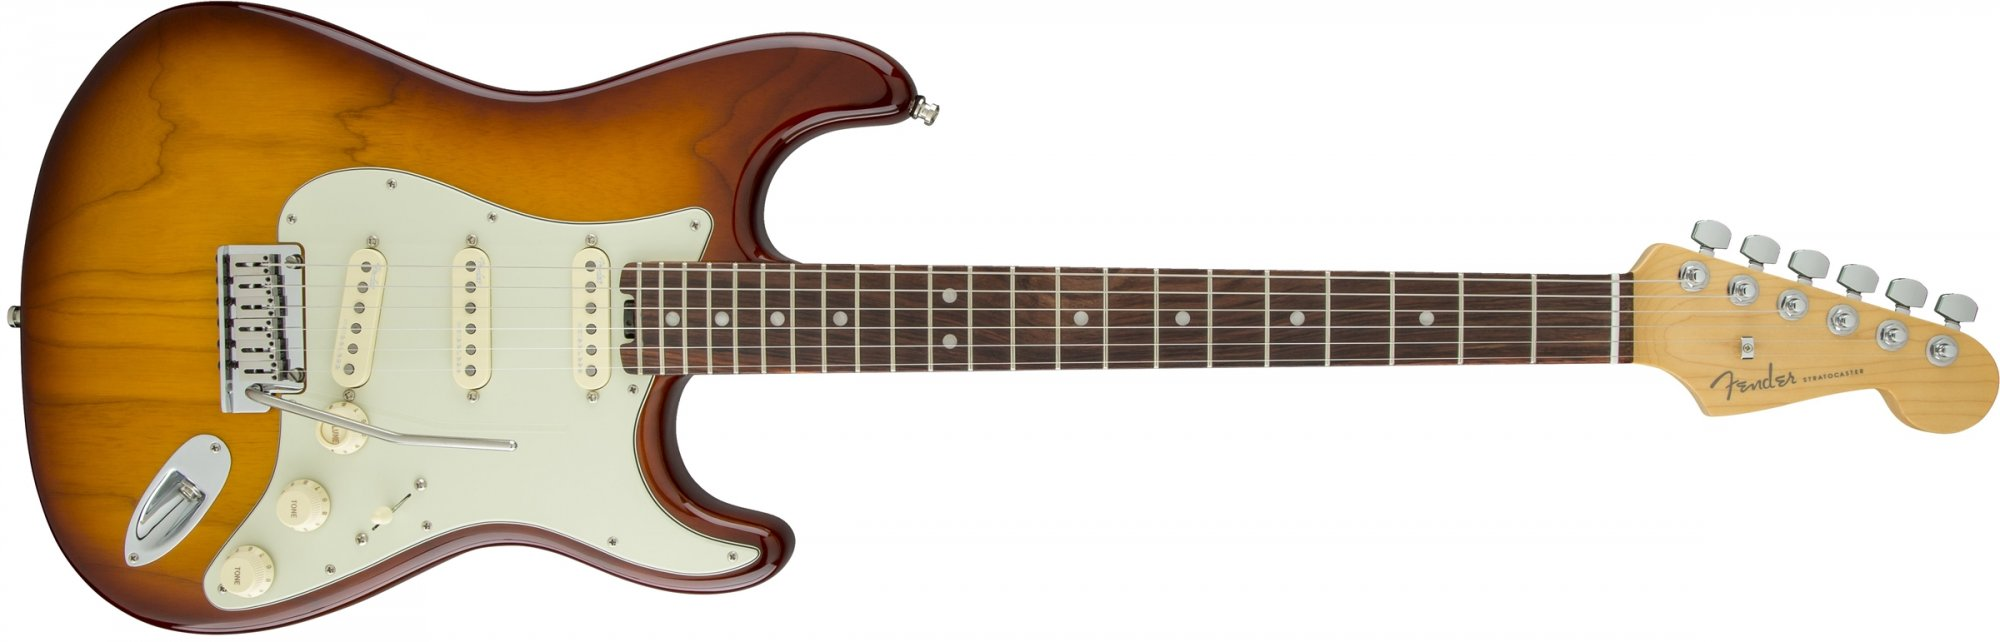 Fender American Elite Stratocaster PF Tobacco Burst